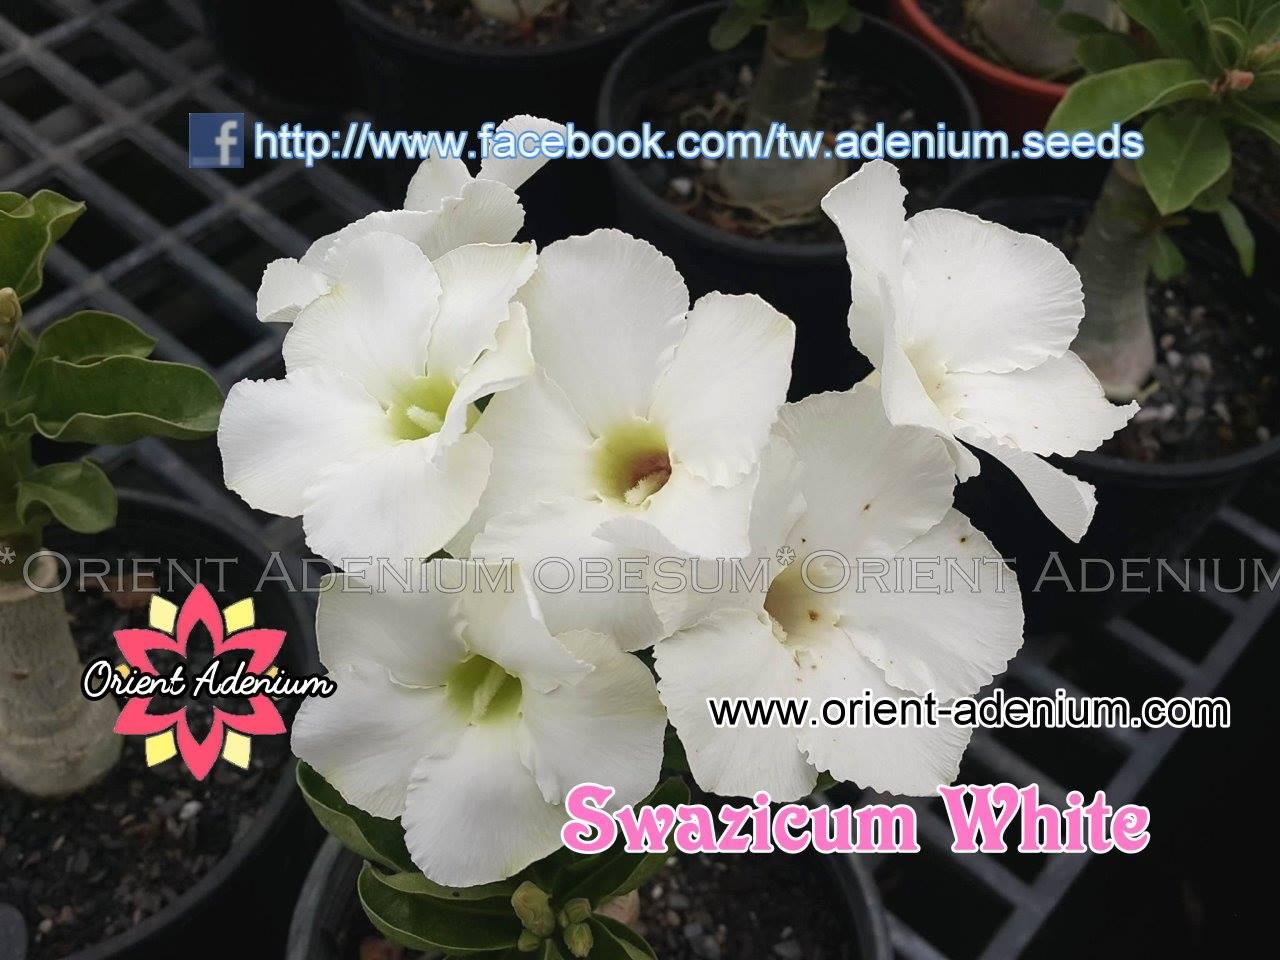 Привитый адениум Swazicum White